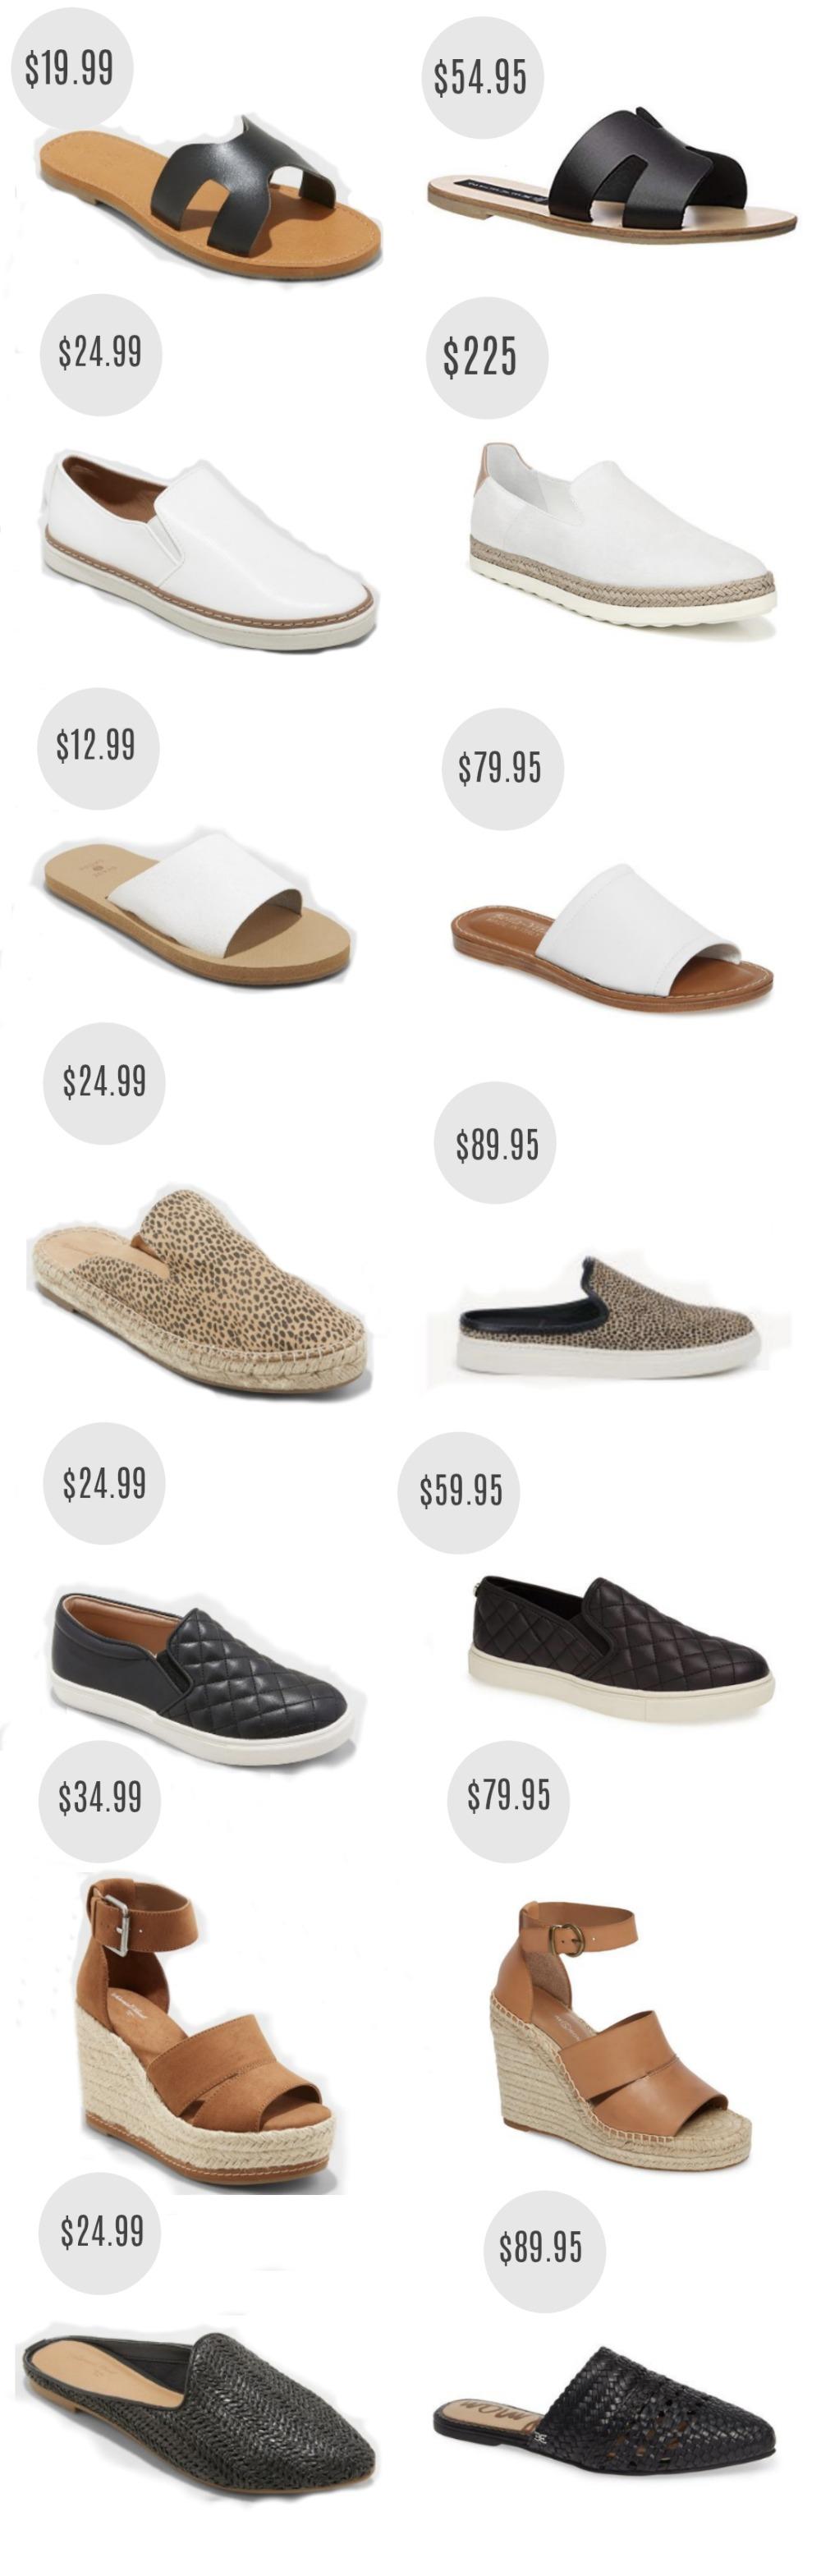 Save vs. Splurge-February 2019